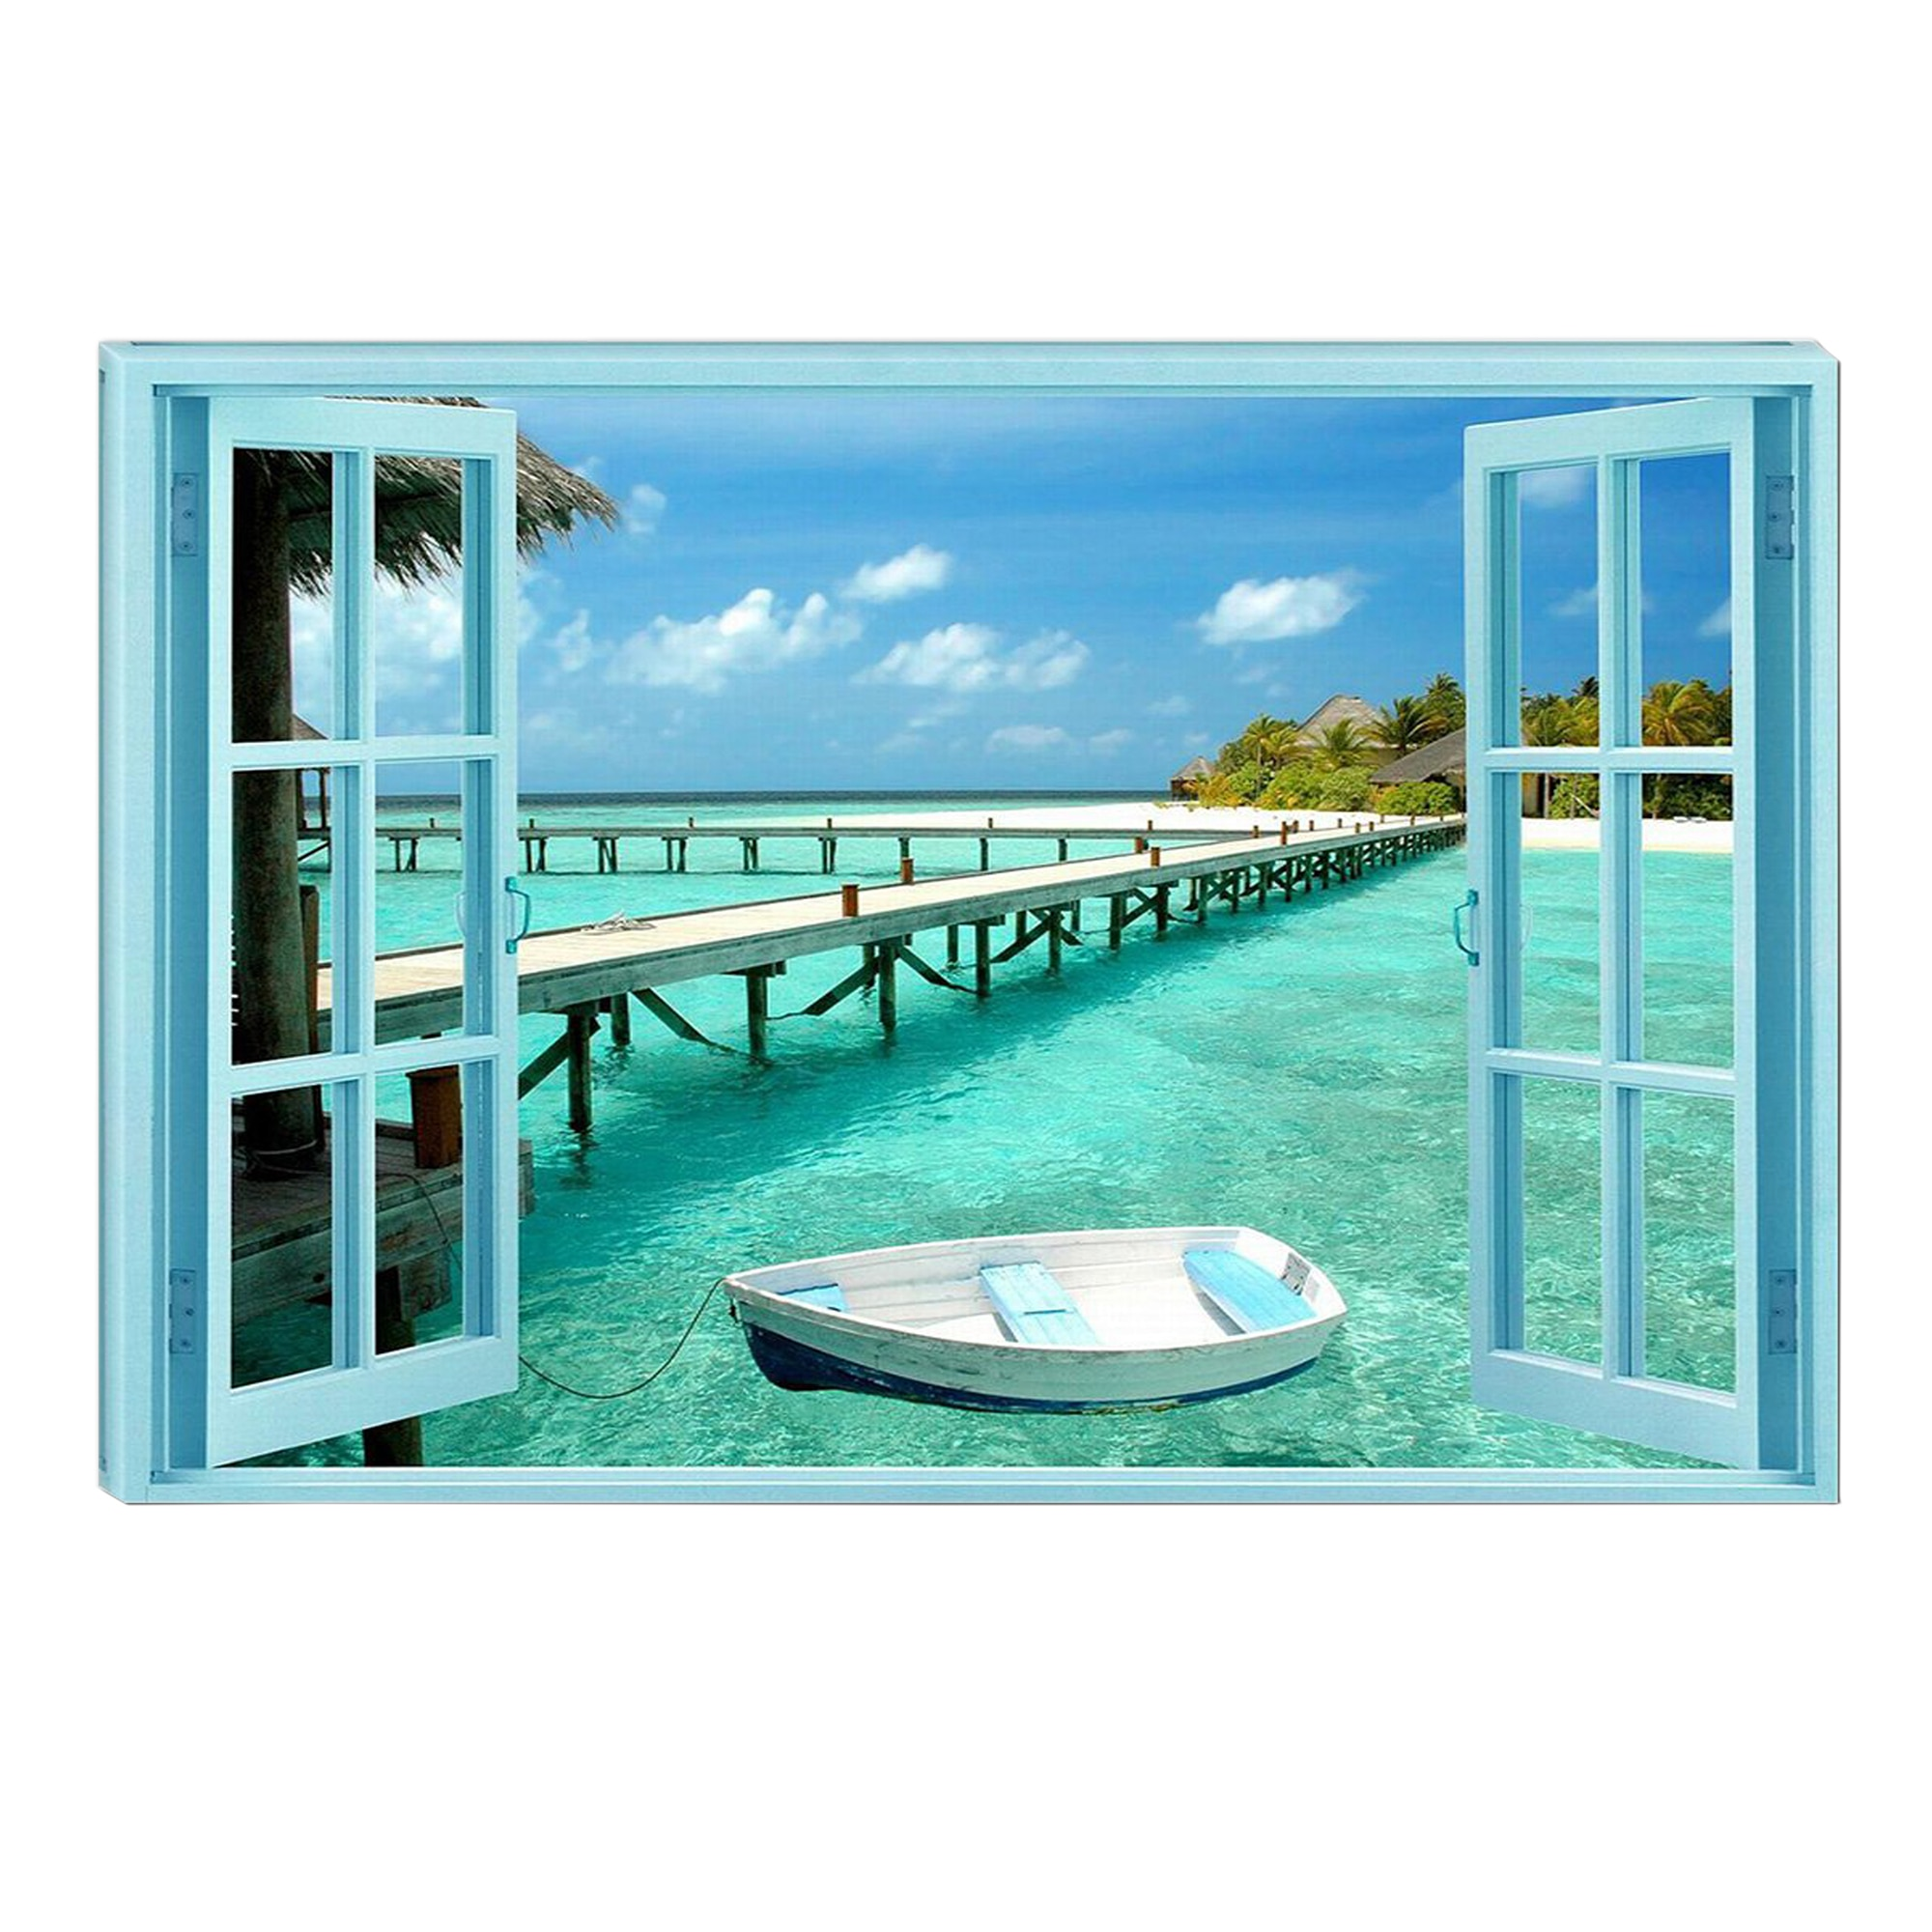 Fotografie Tablou DualView Startonight Raiul pe Pamant, Plaja, Luminos in intuneric, 70 x 100 cm